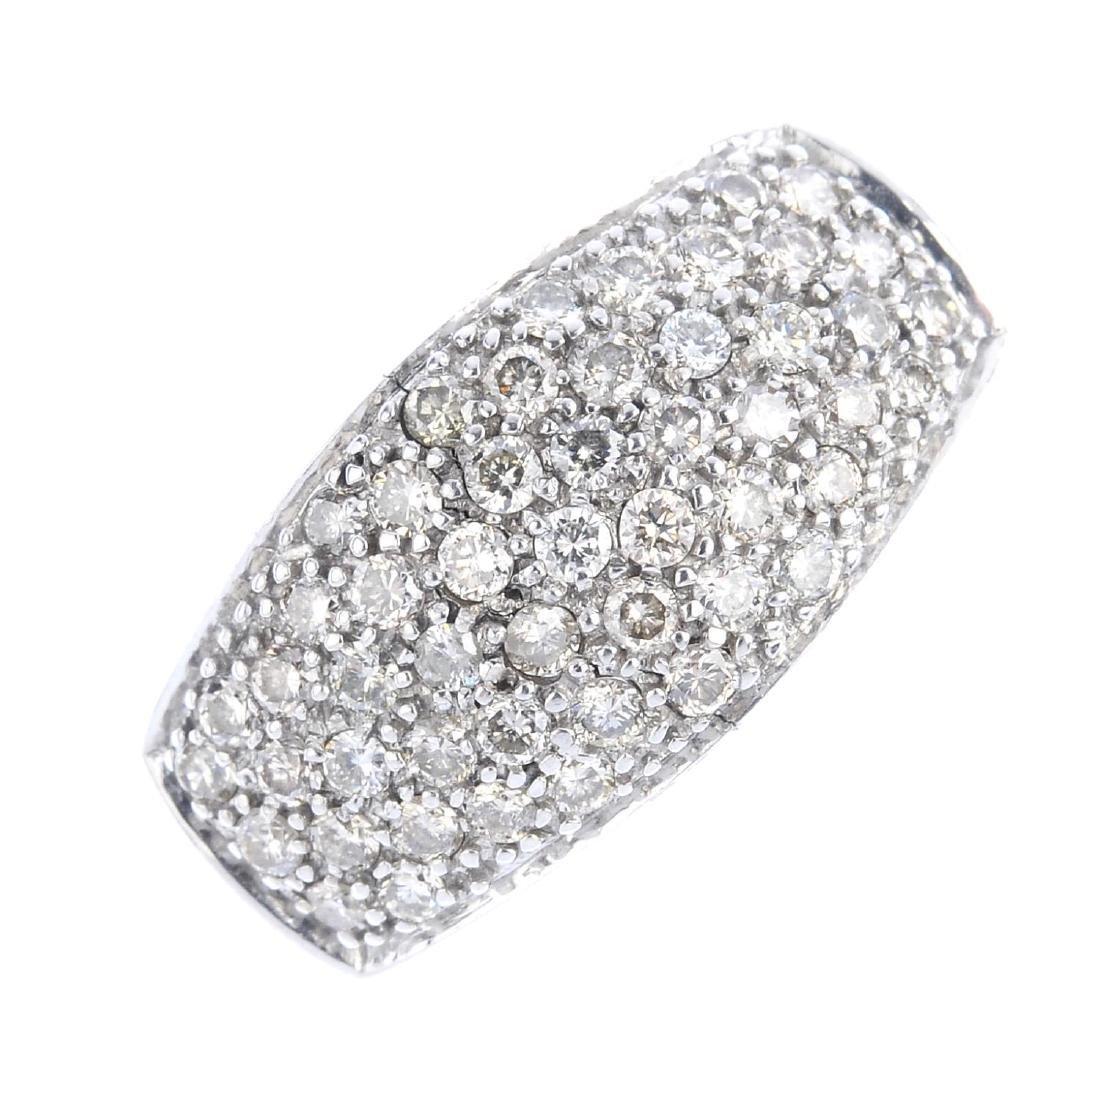 A 9ct gold diamond dress ring. The pave-set diamond